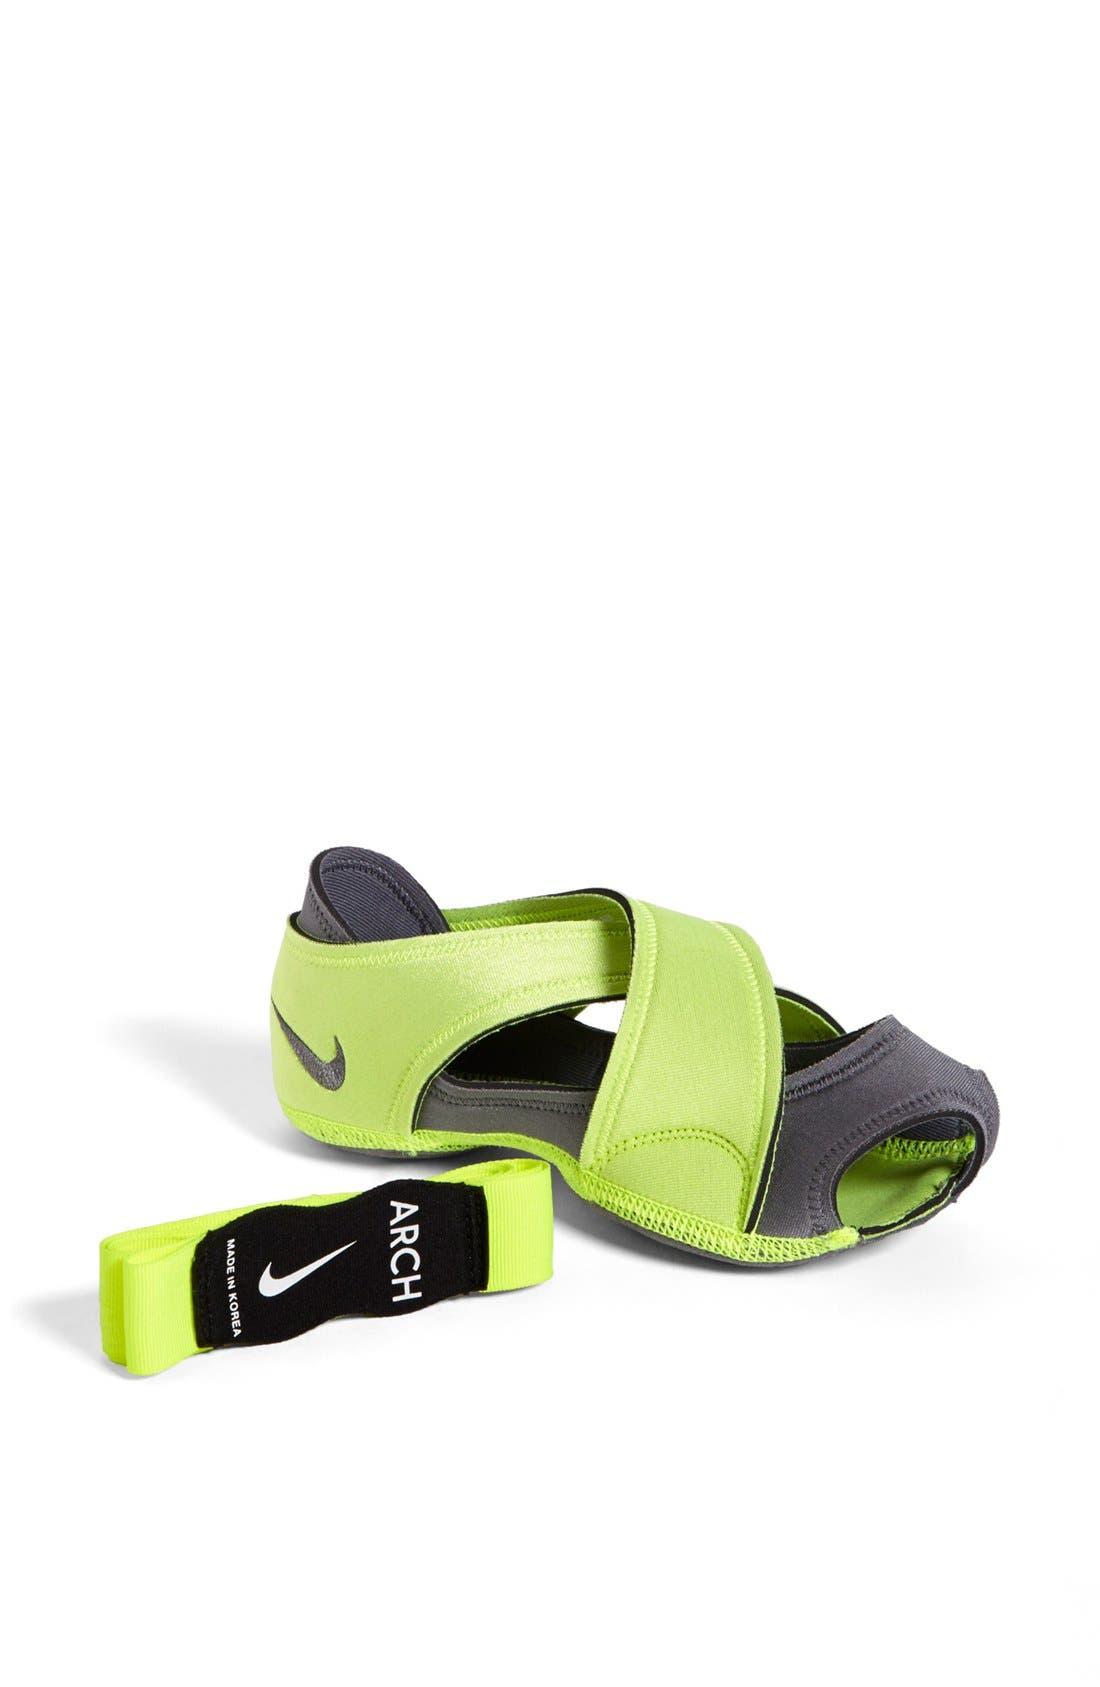 Alternate Image 3  - Nike 'Studio Wrap Pack' Yoga Training Shoe (Women)